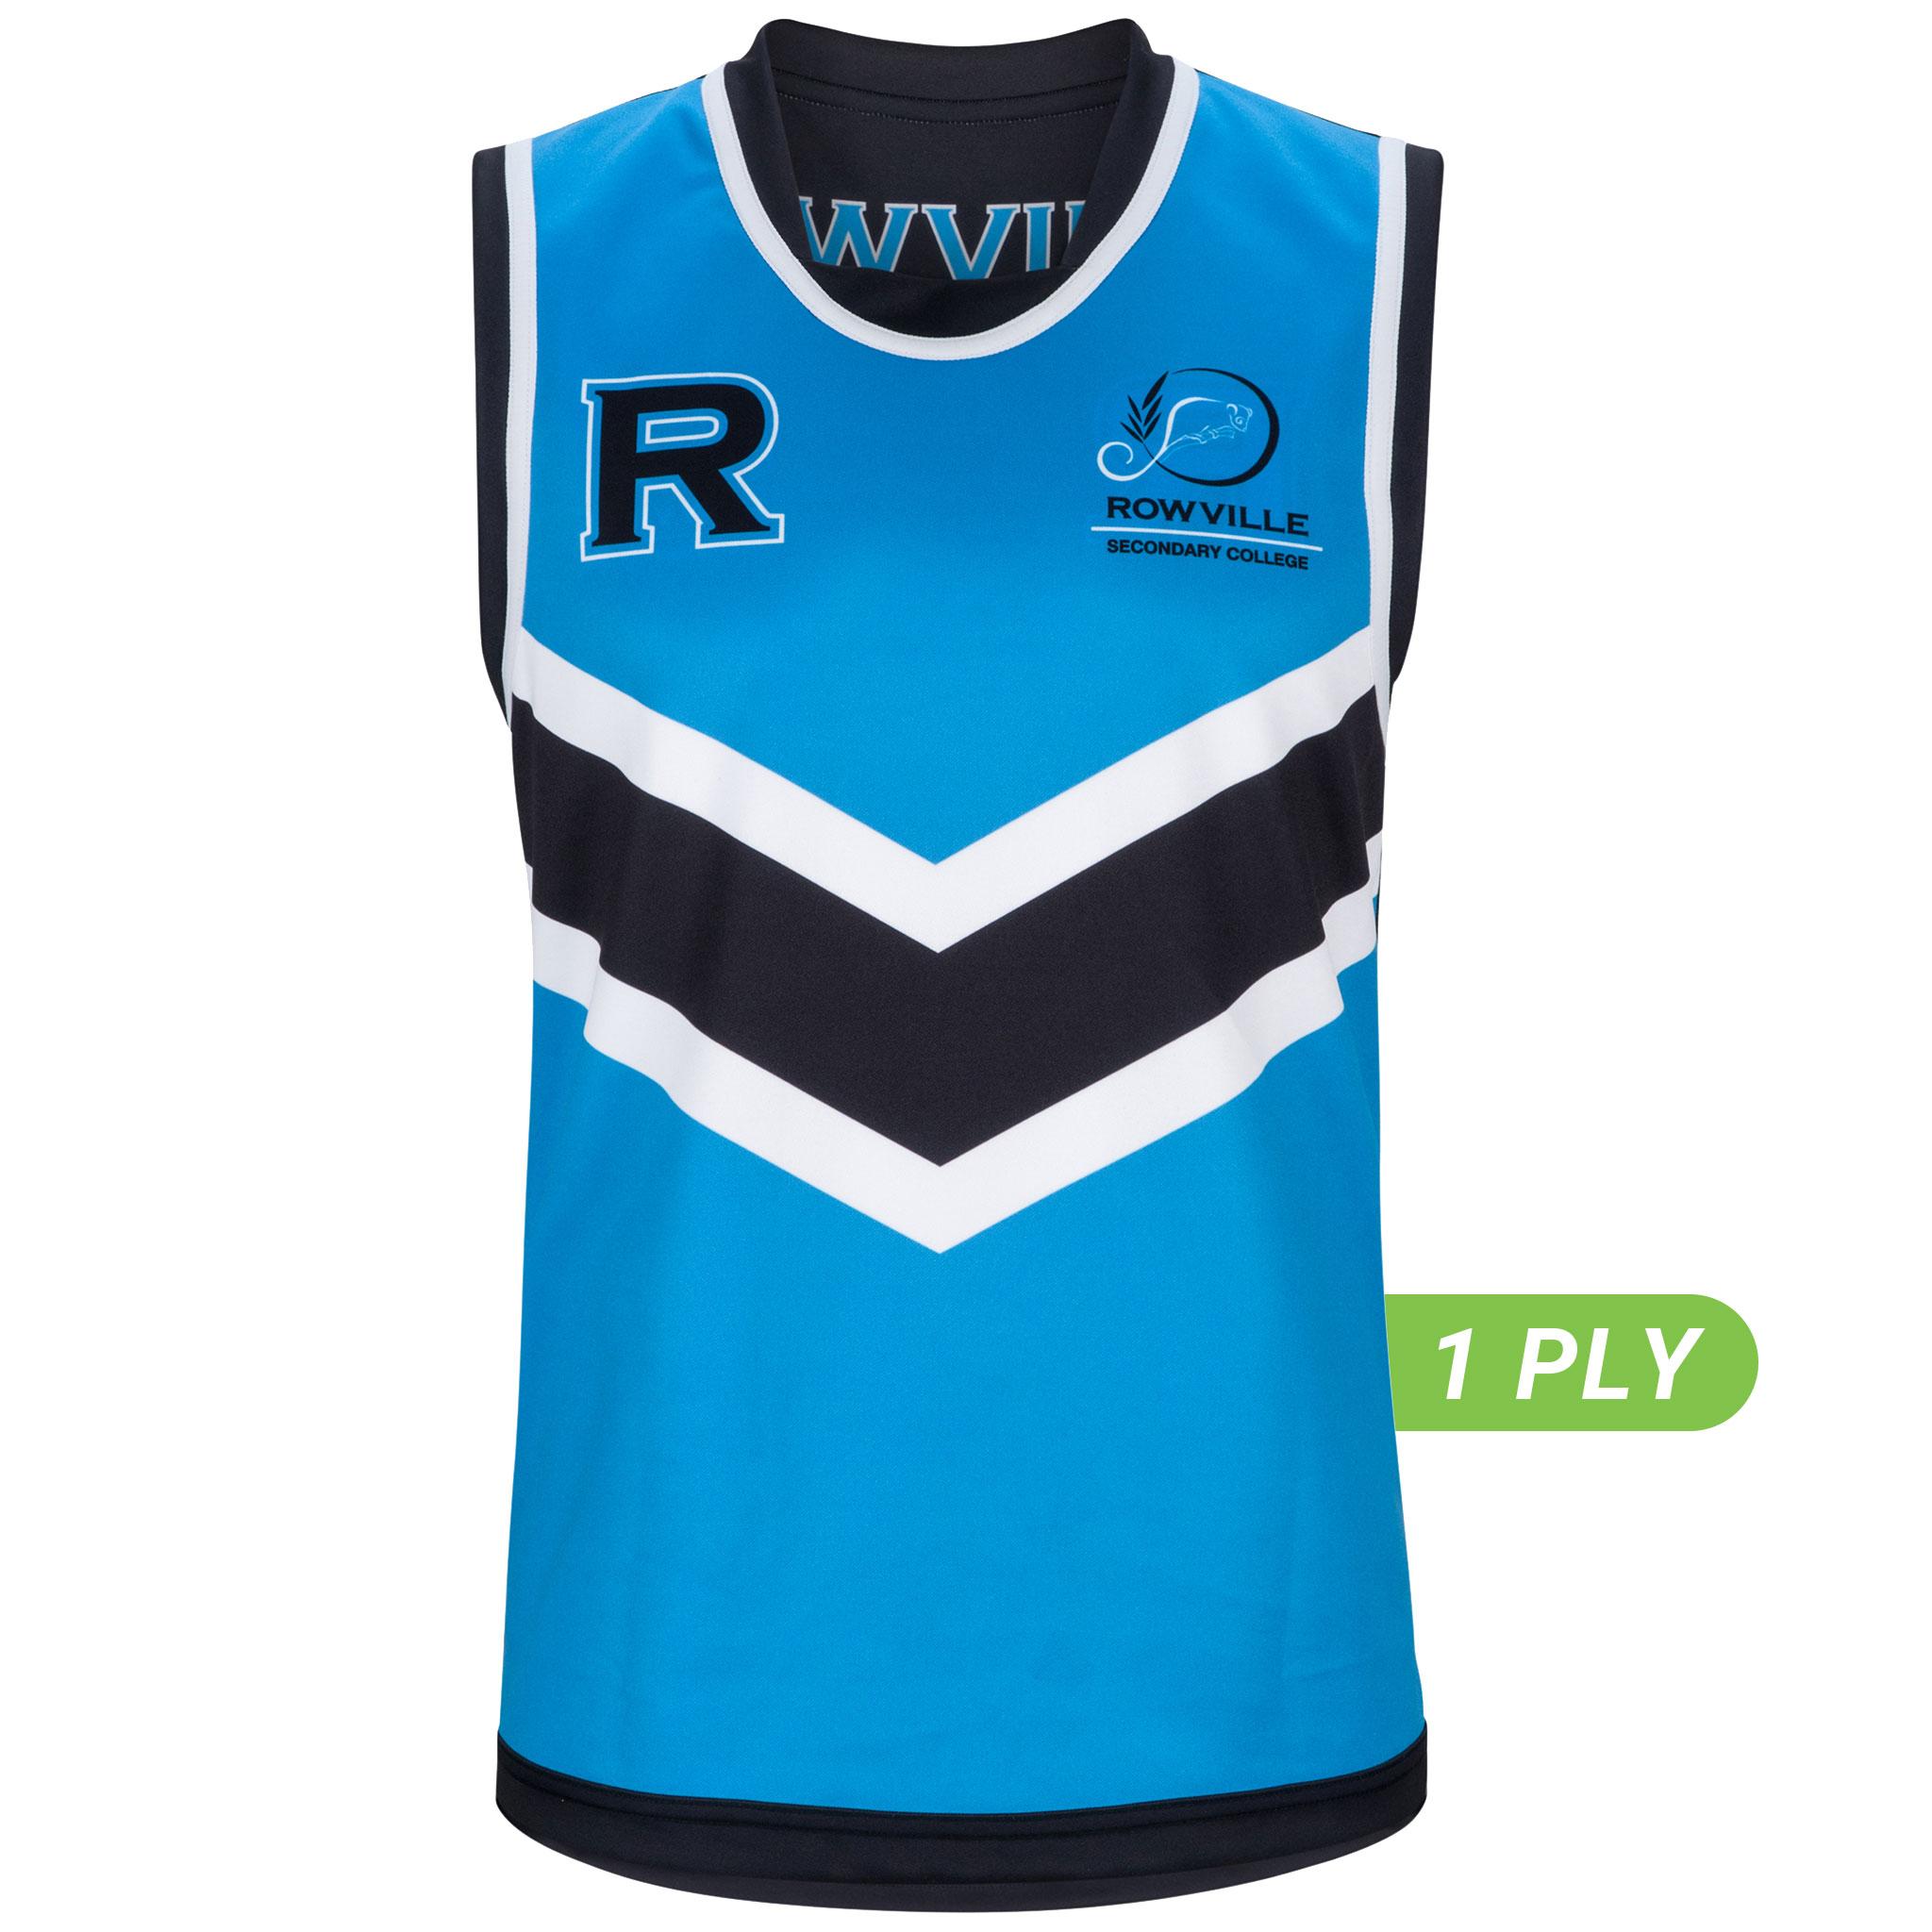 1 PLY Reversible AFL Top